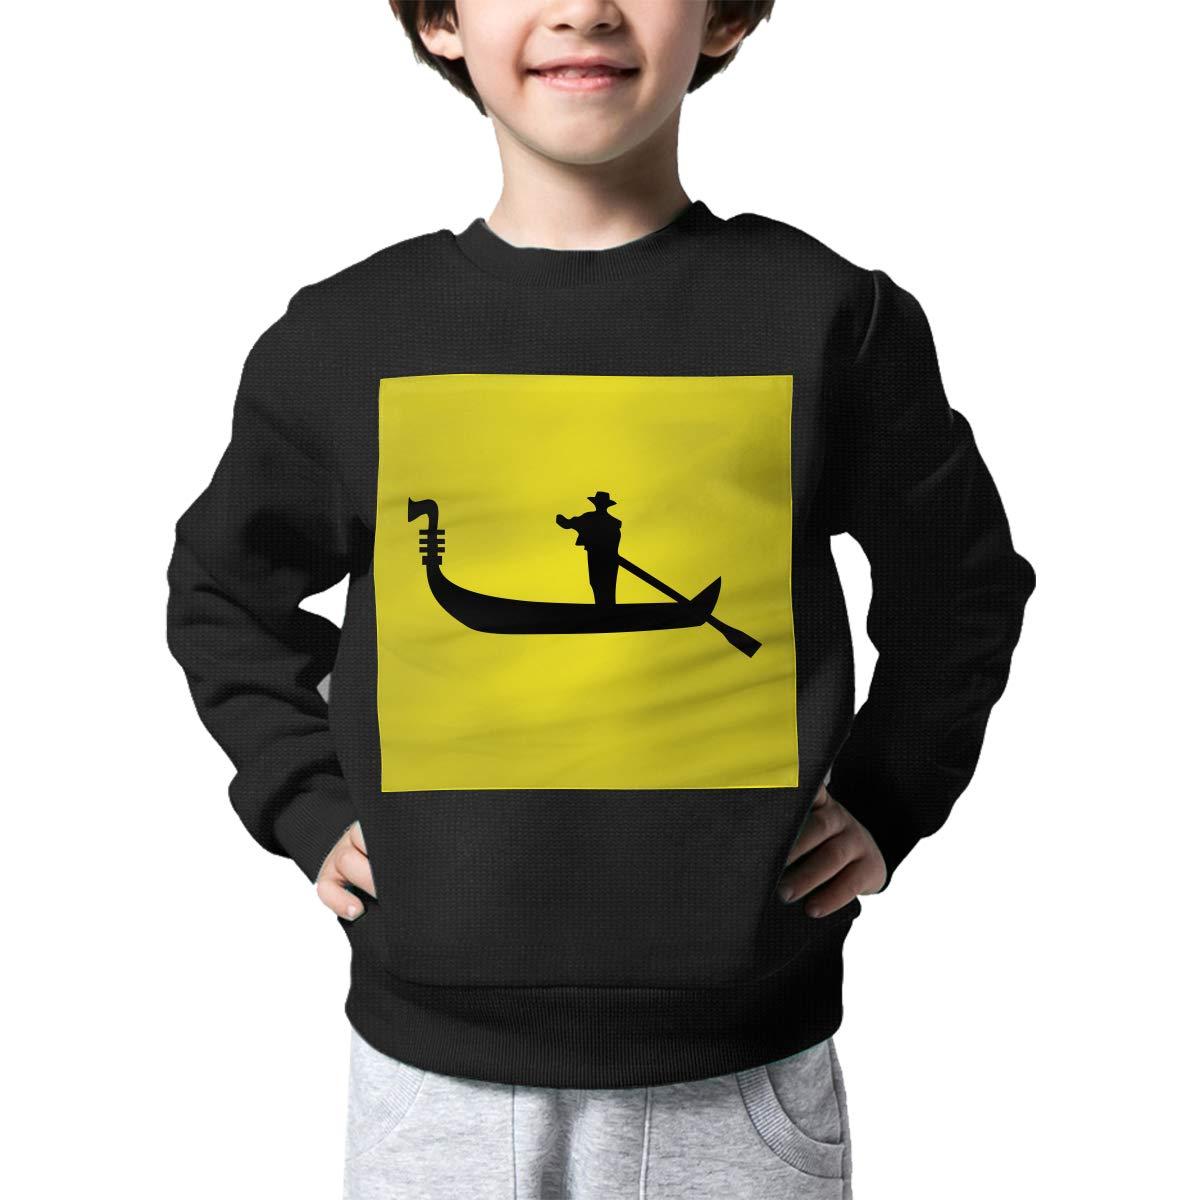 AW-KOCP Childrens Gondola Canoe Sweater Kids Pullover Sweaters